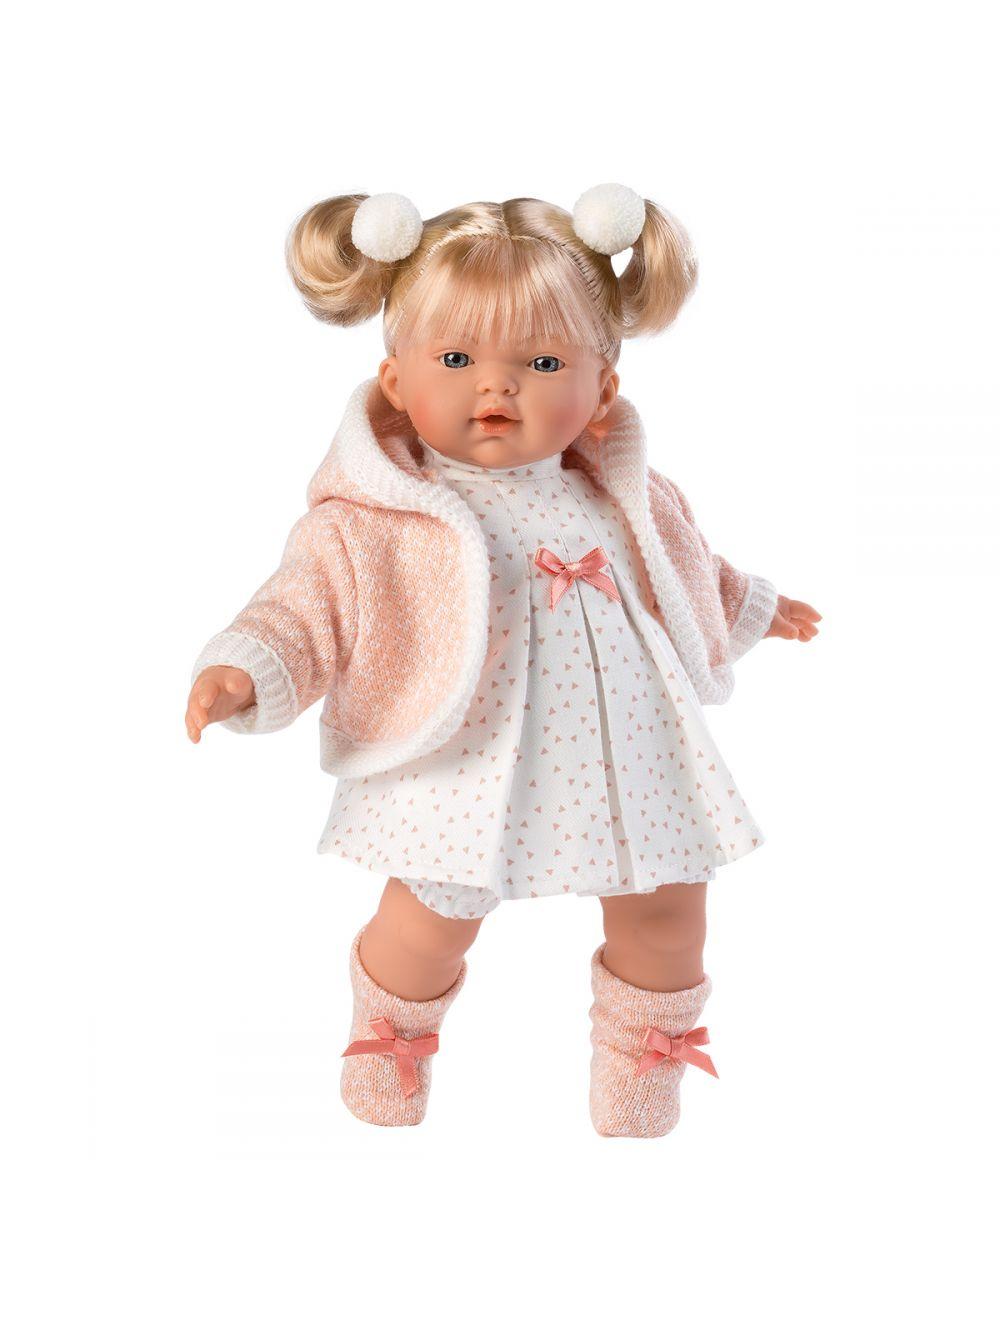 Llorens 33296 Lalka płacząca Roberta 33 cm różowa blondynka